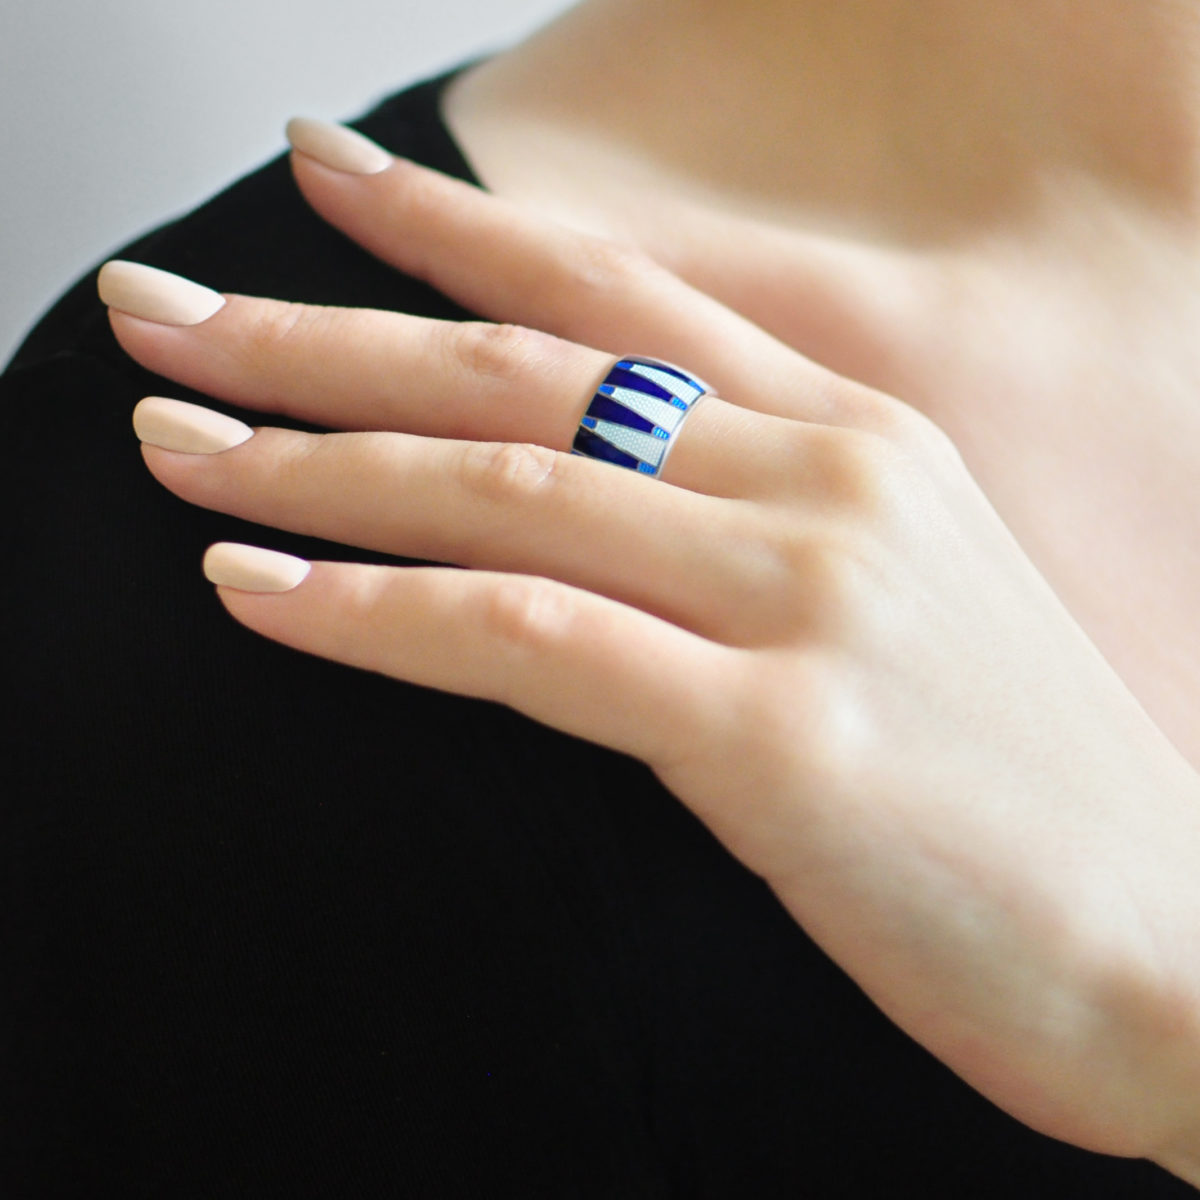 Serebro sinyaya 15 1200x1200 - Кольцо из серебра «Тамтам», синяя